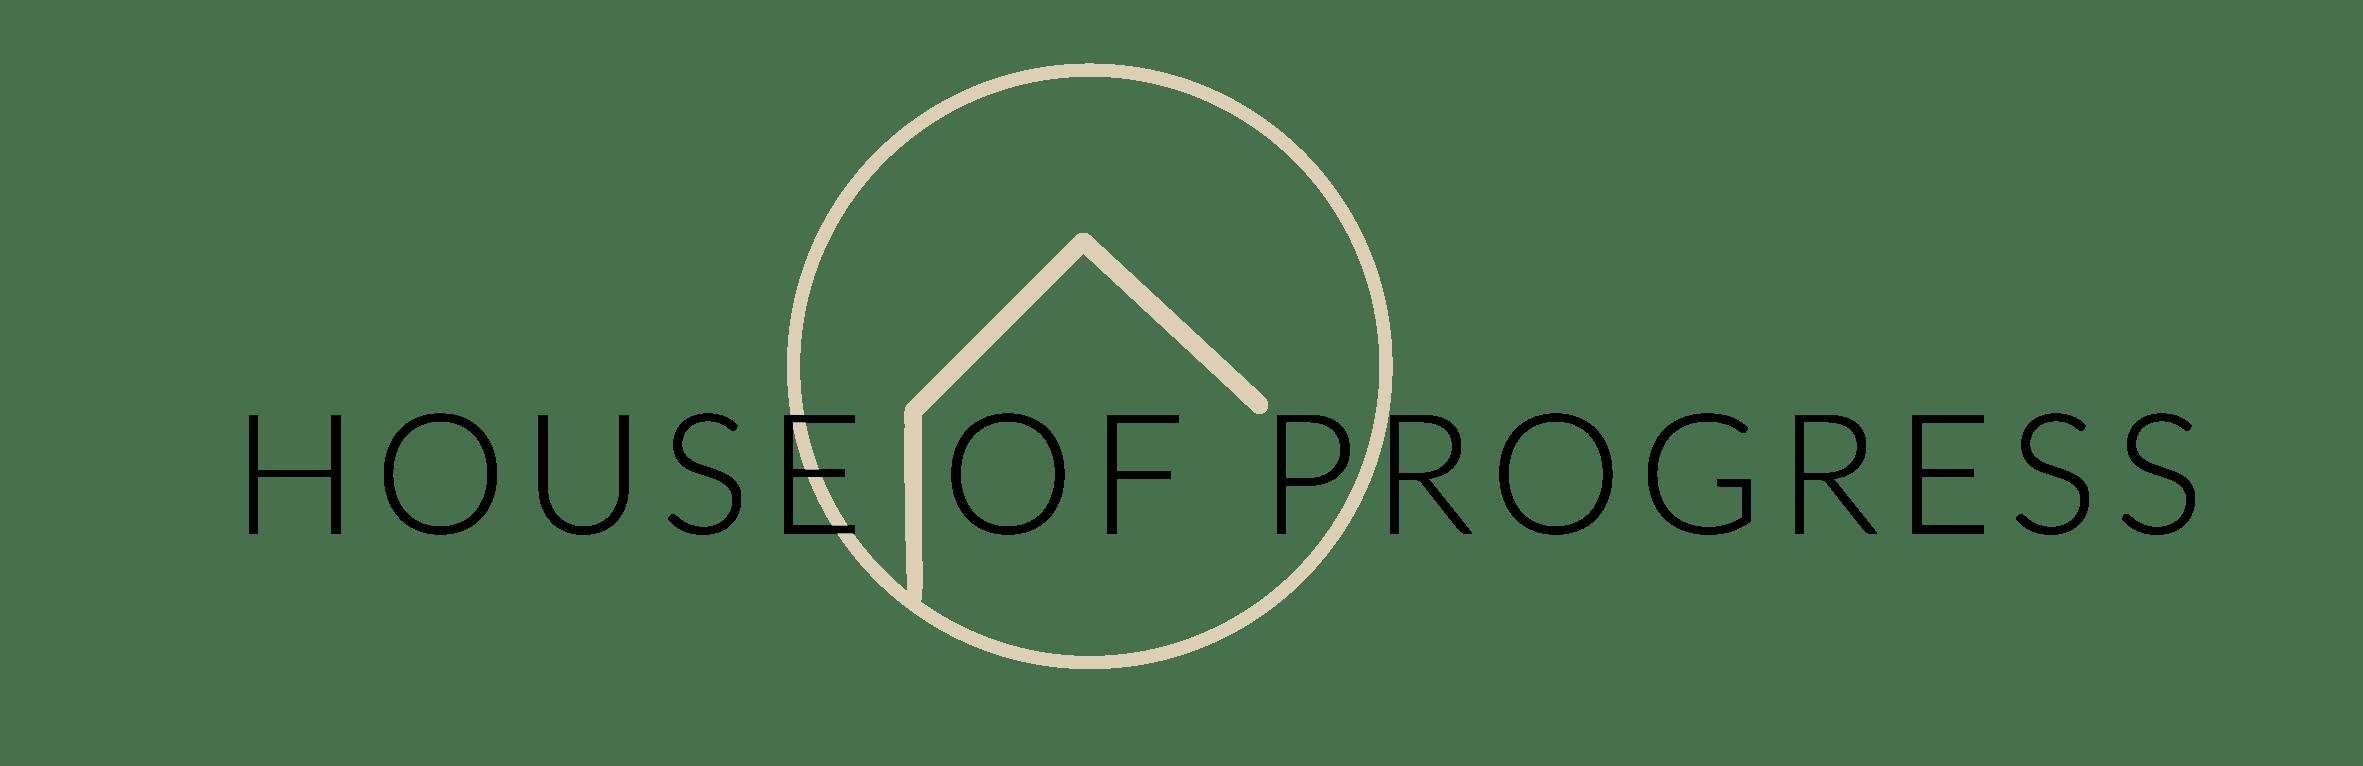 logo house of progress